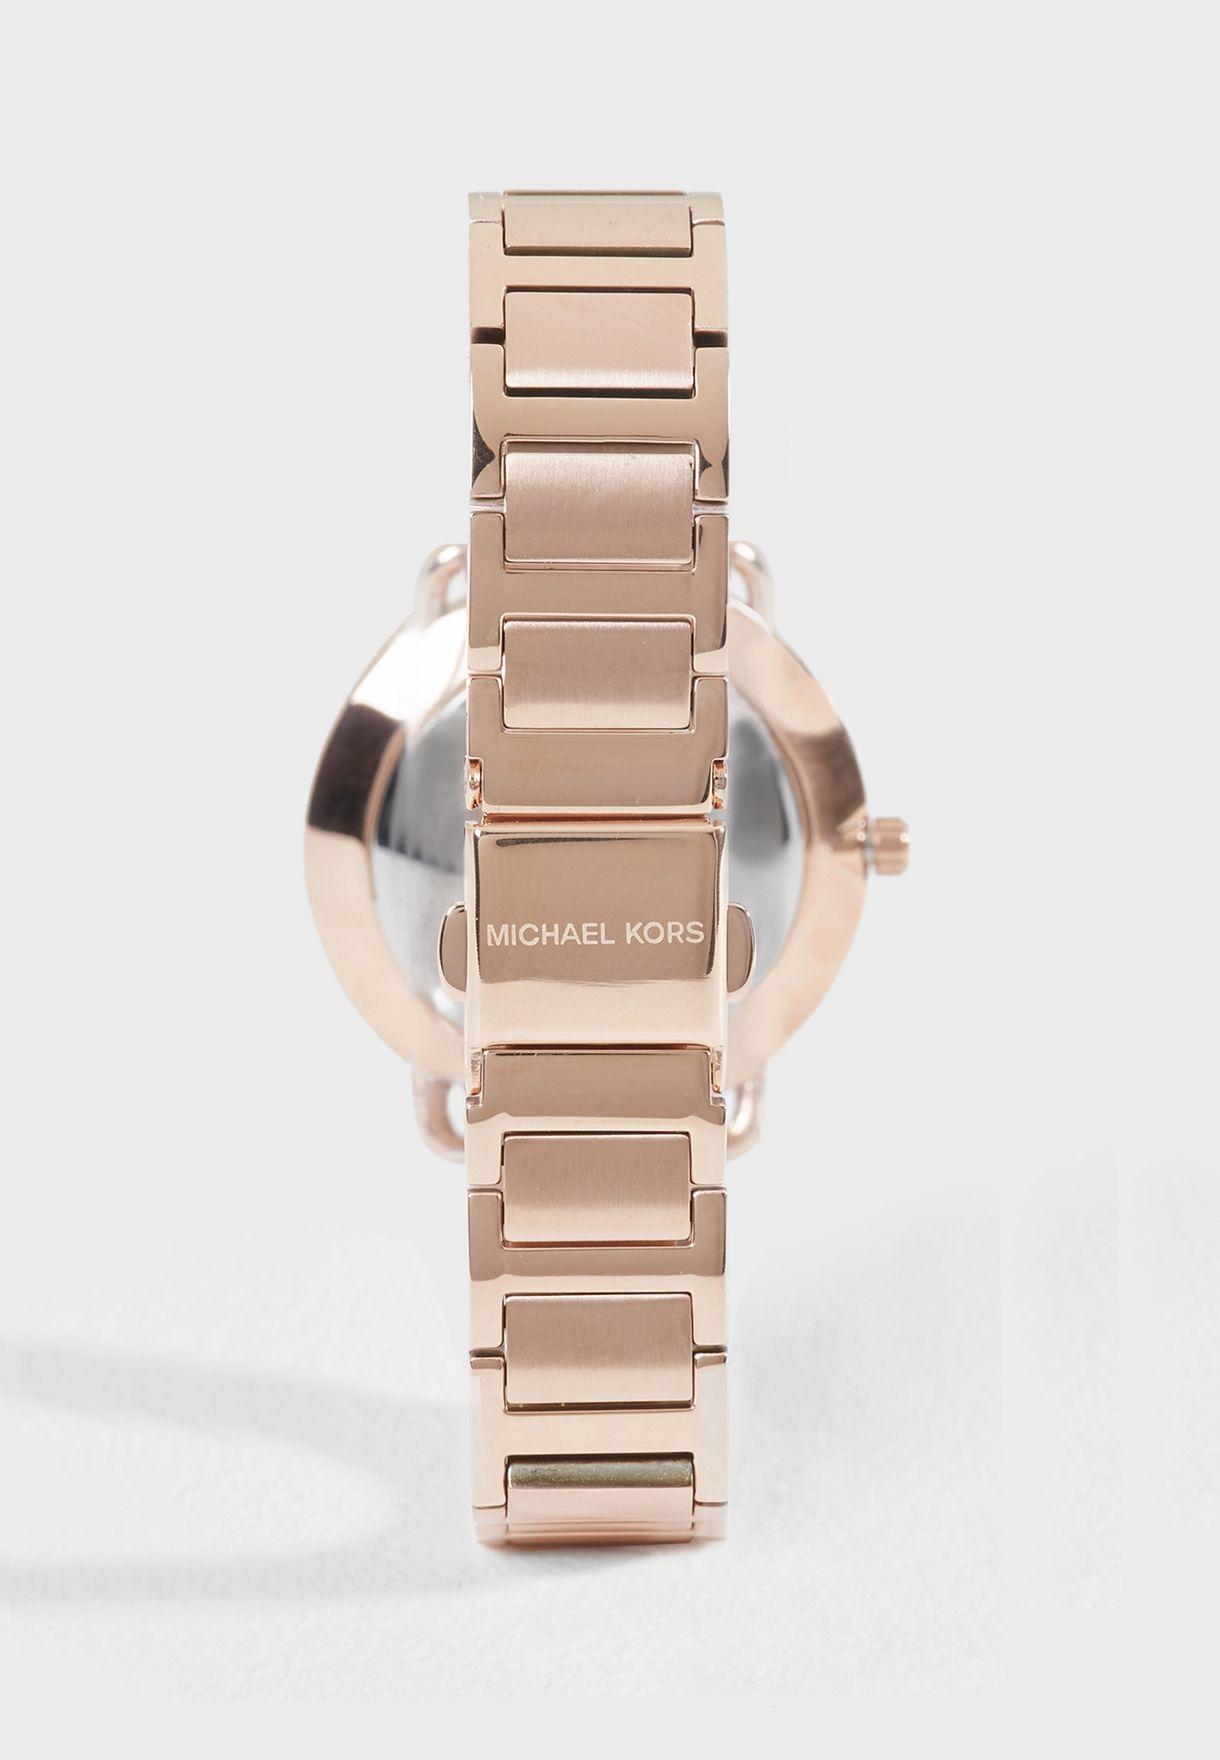 4ace5a41b3d3 Shop Michael Kors gold Portia Watch MK3841 for Women in UAE ...